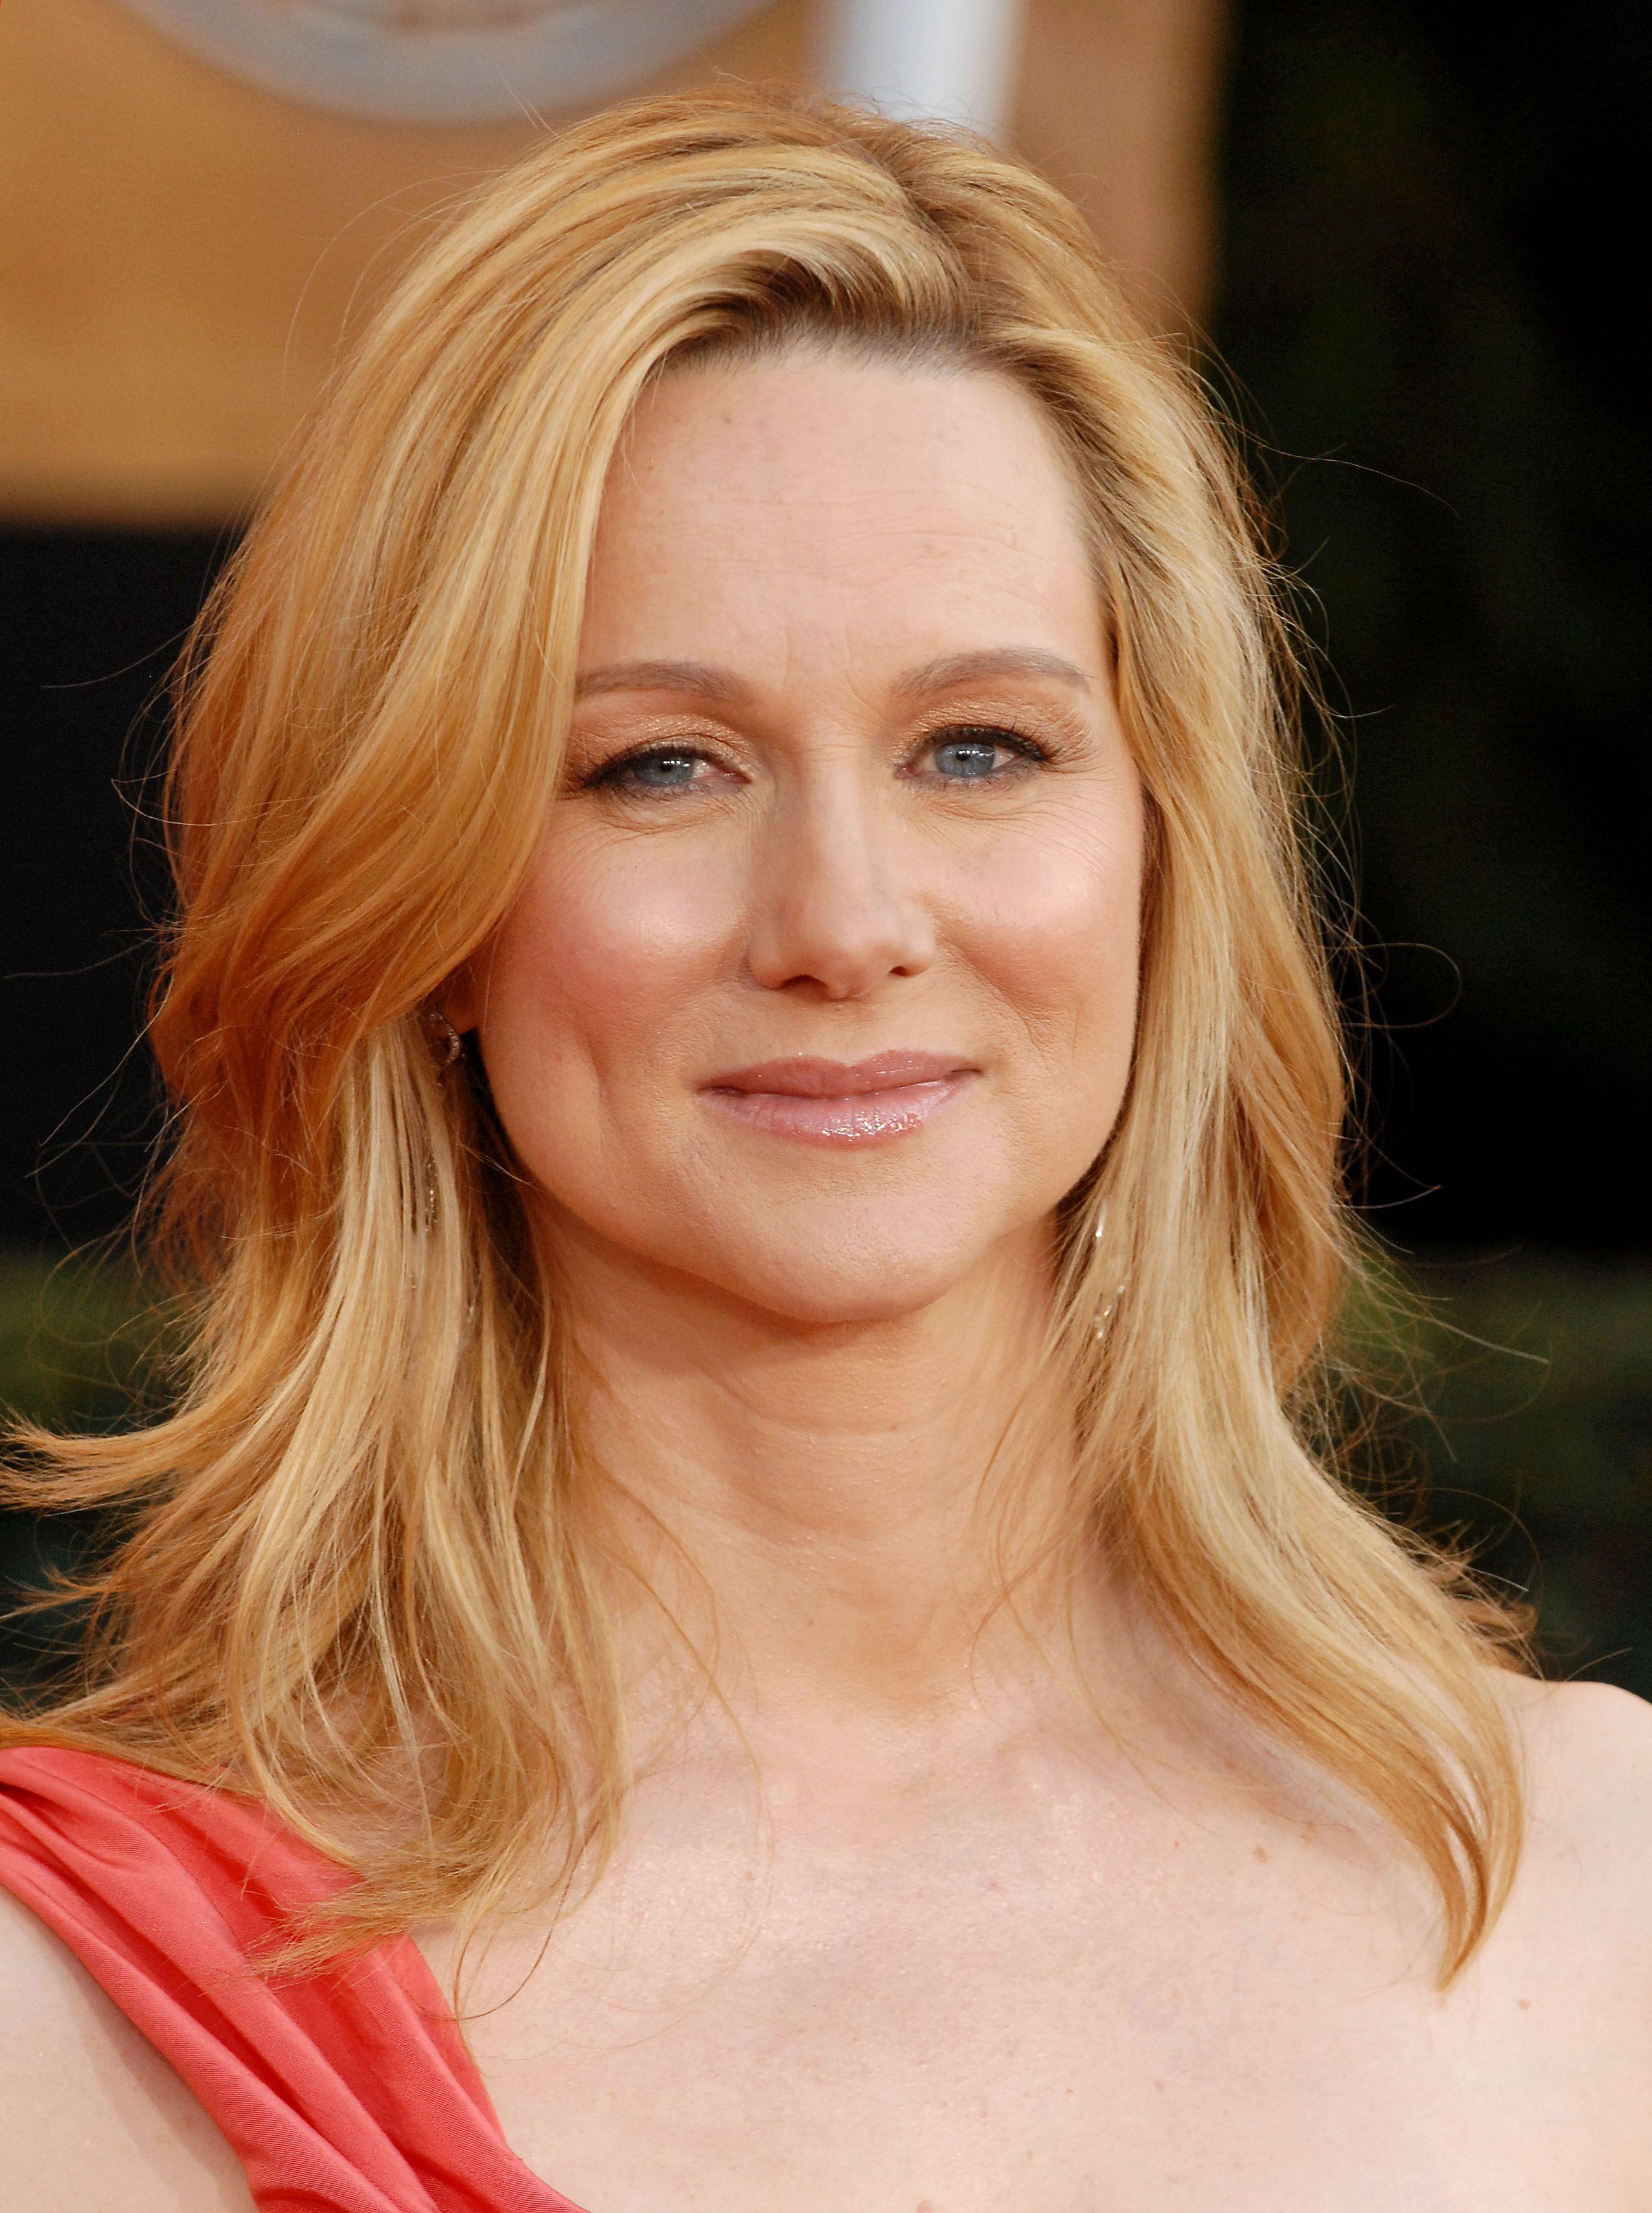 laura linney movie actress leaked celebs pinterest